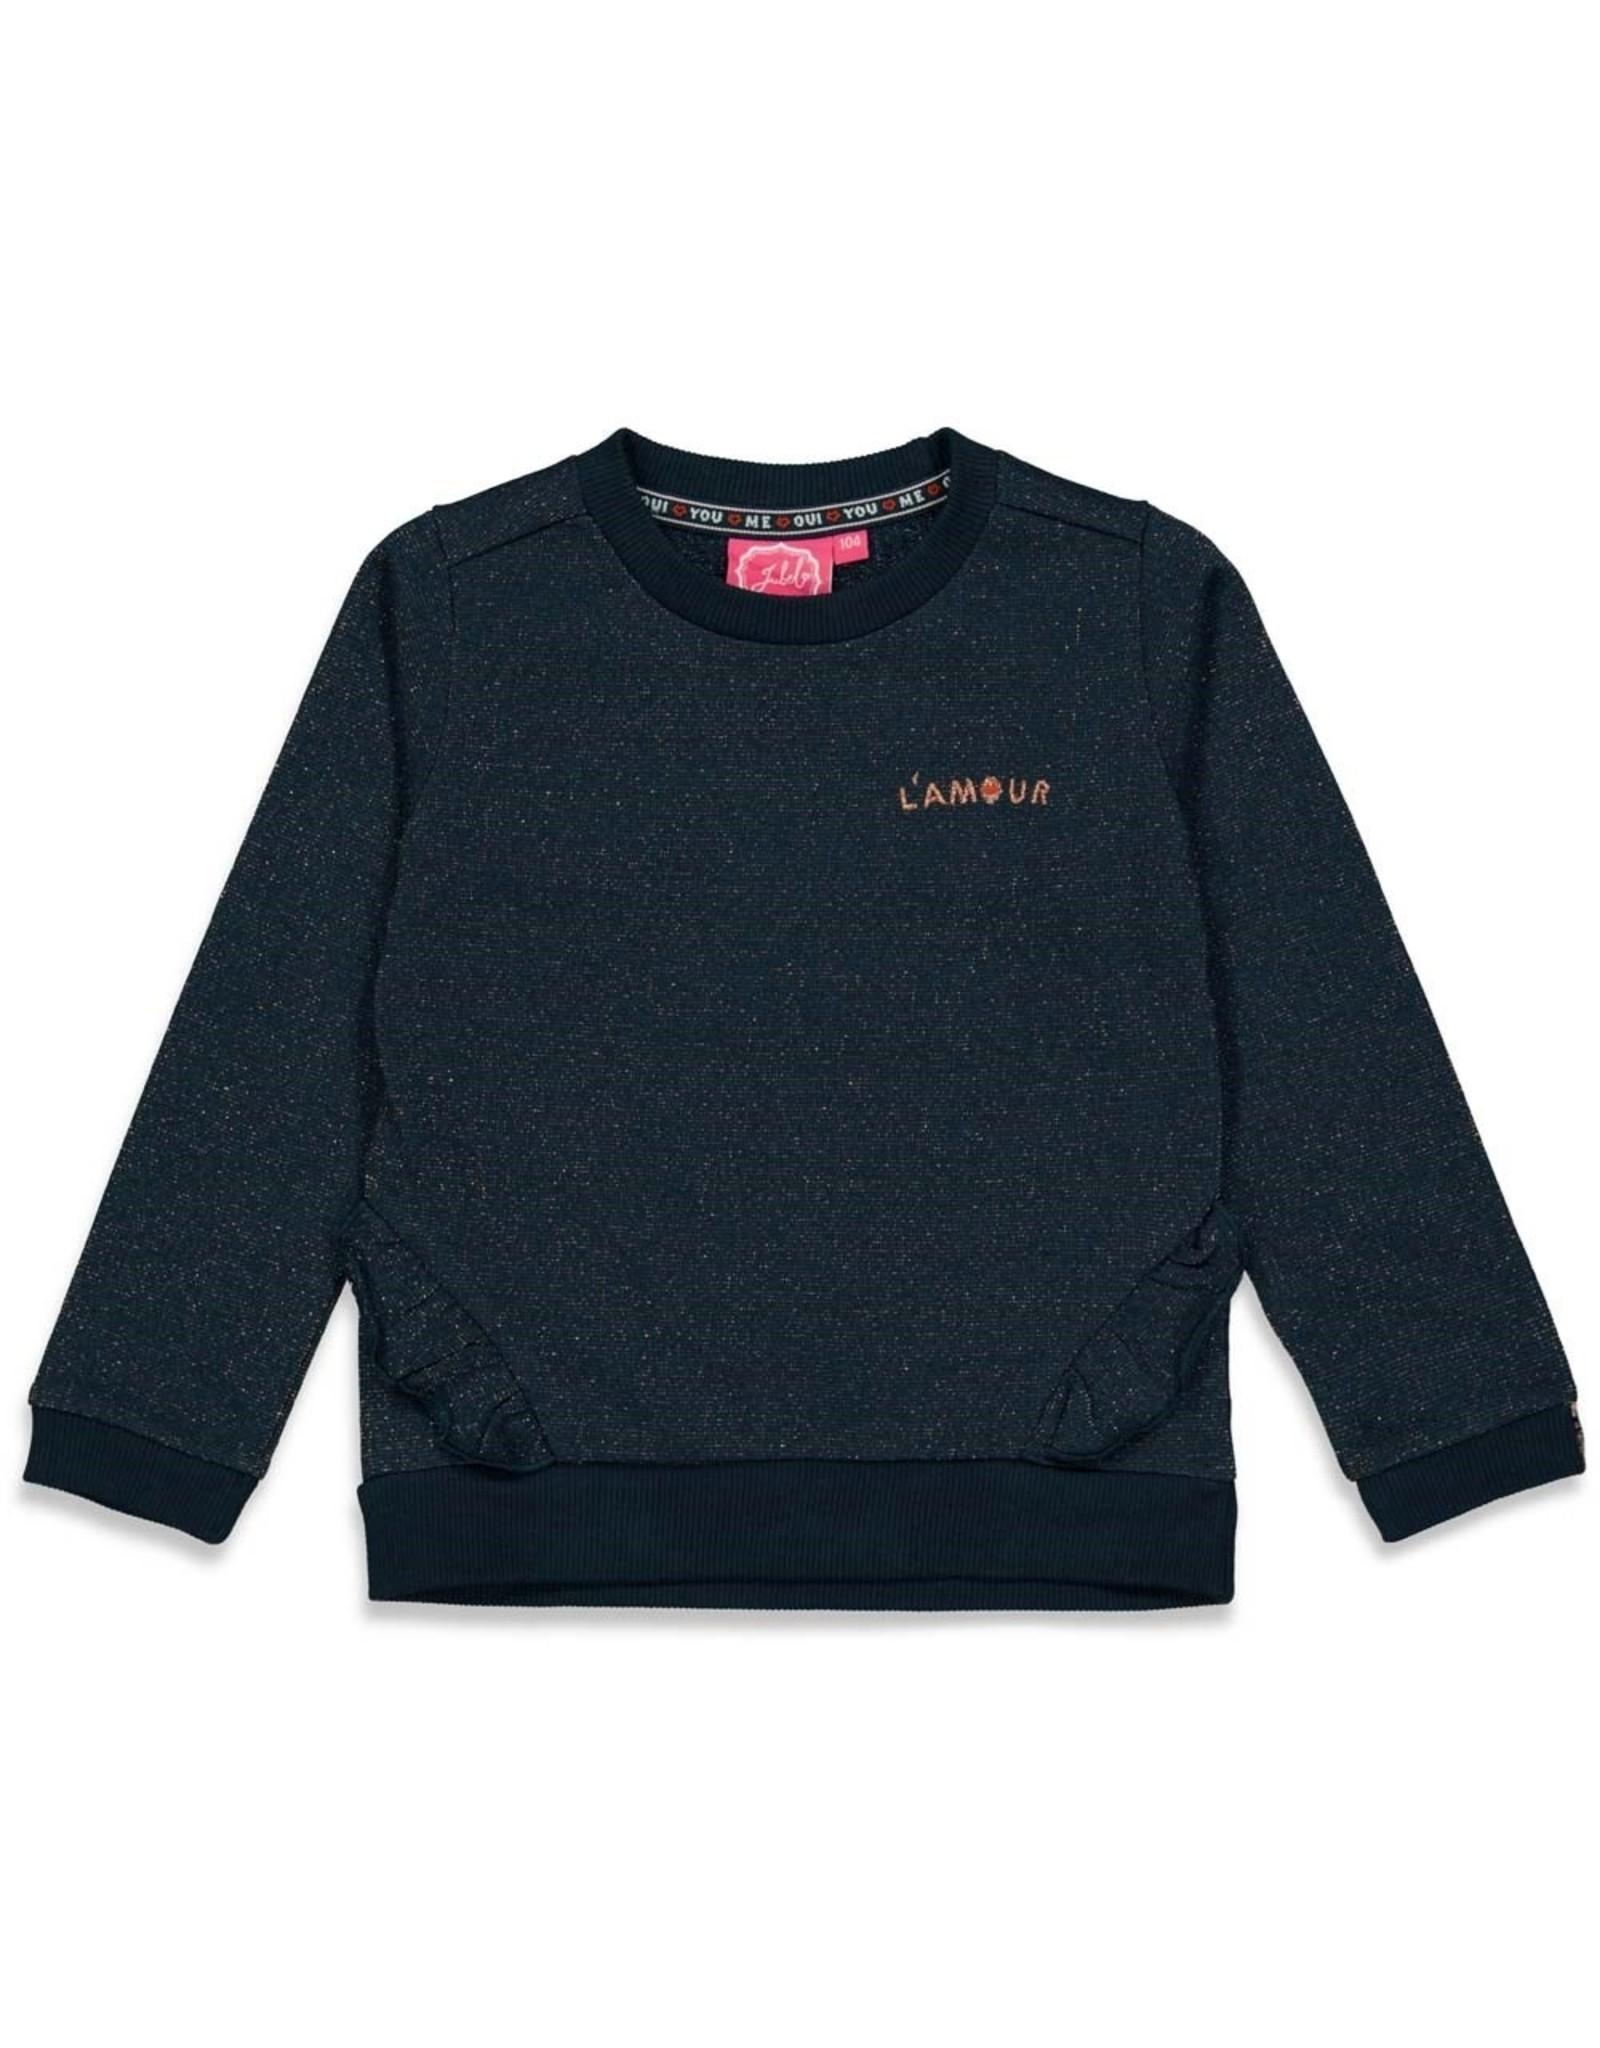 Jubel Jubel sweater marine Club Amour